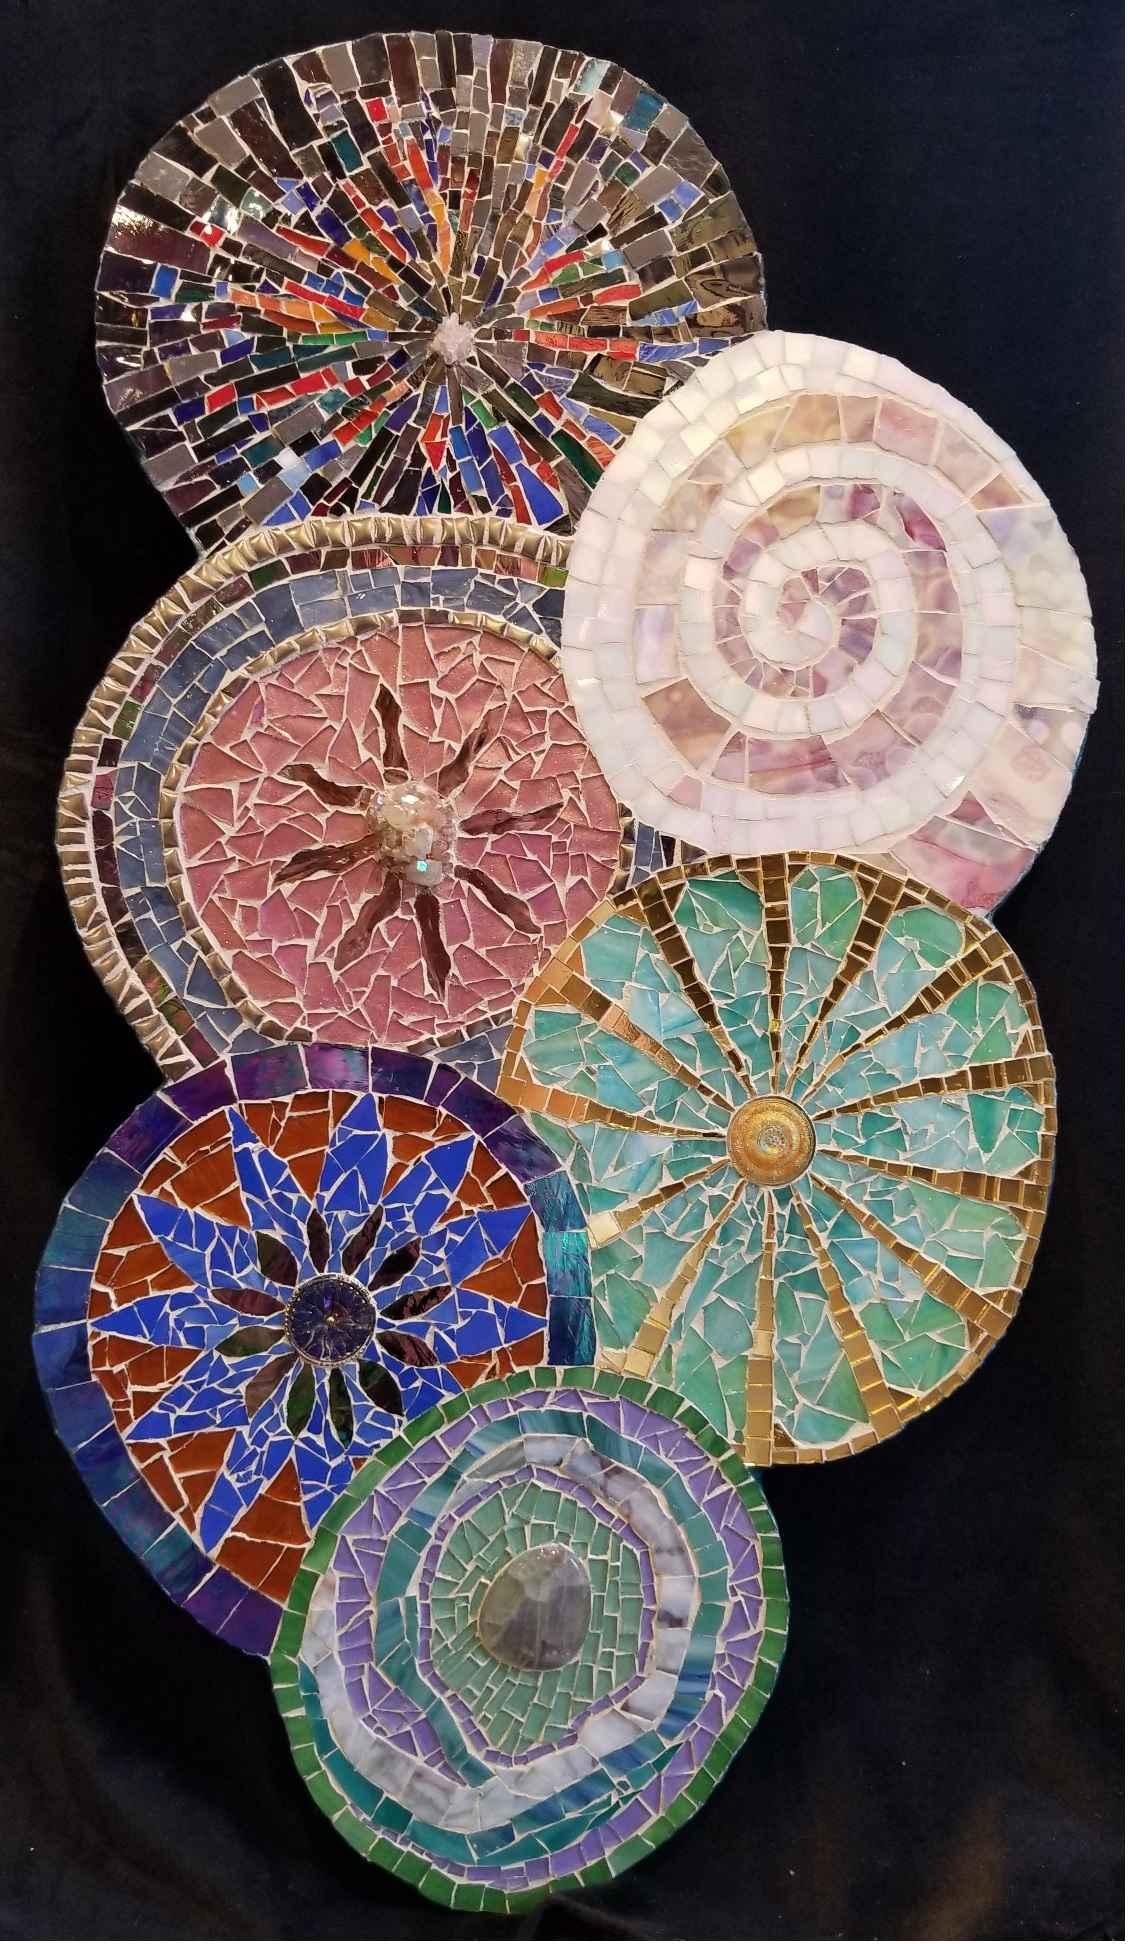 Mandalas by  Gala Kraftsow - Masterpiece Online